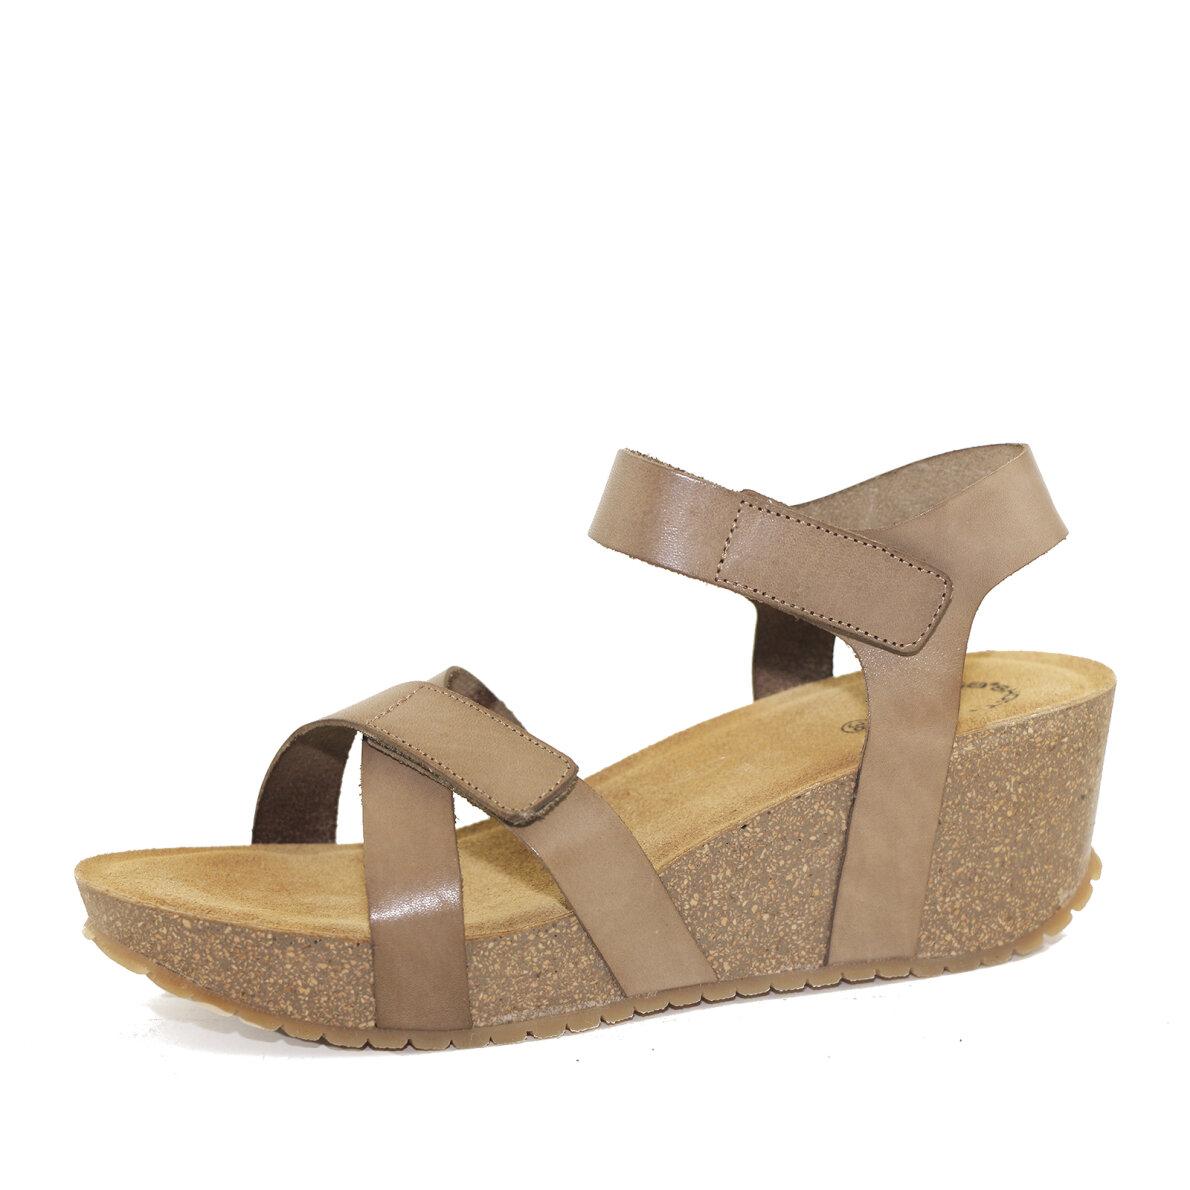 PIEDI Cashott 20271 Taupefarvet dame sandal med kilehæl